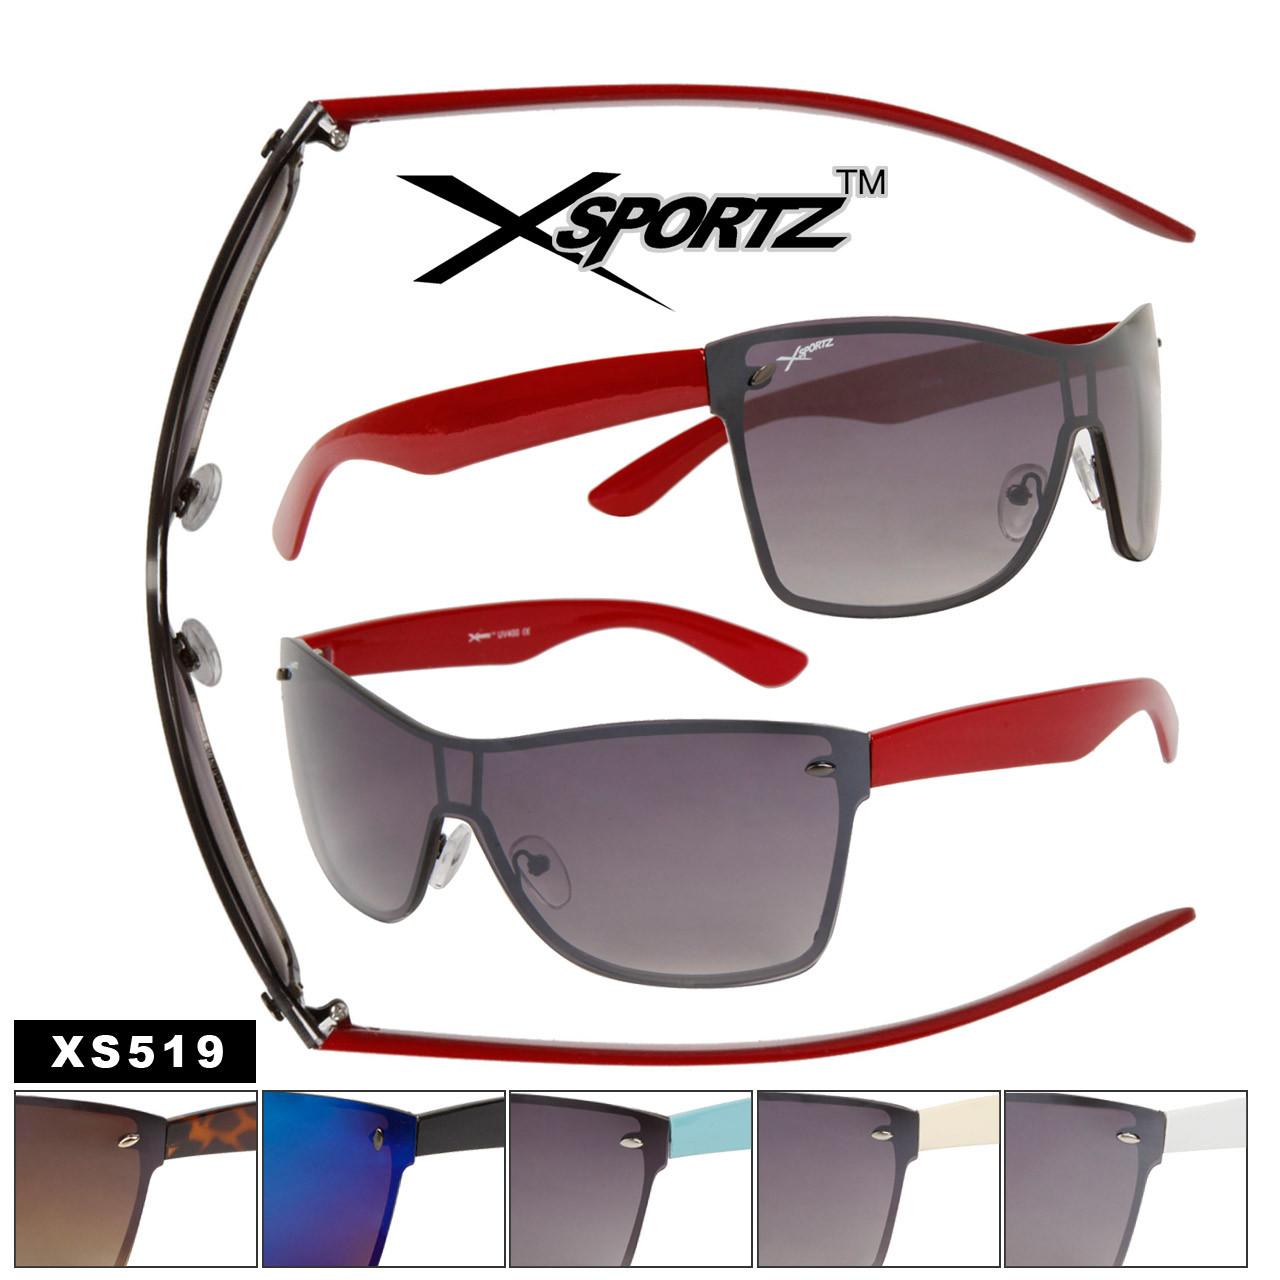 Single Piece Lens Xsportz!